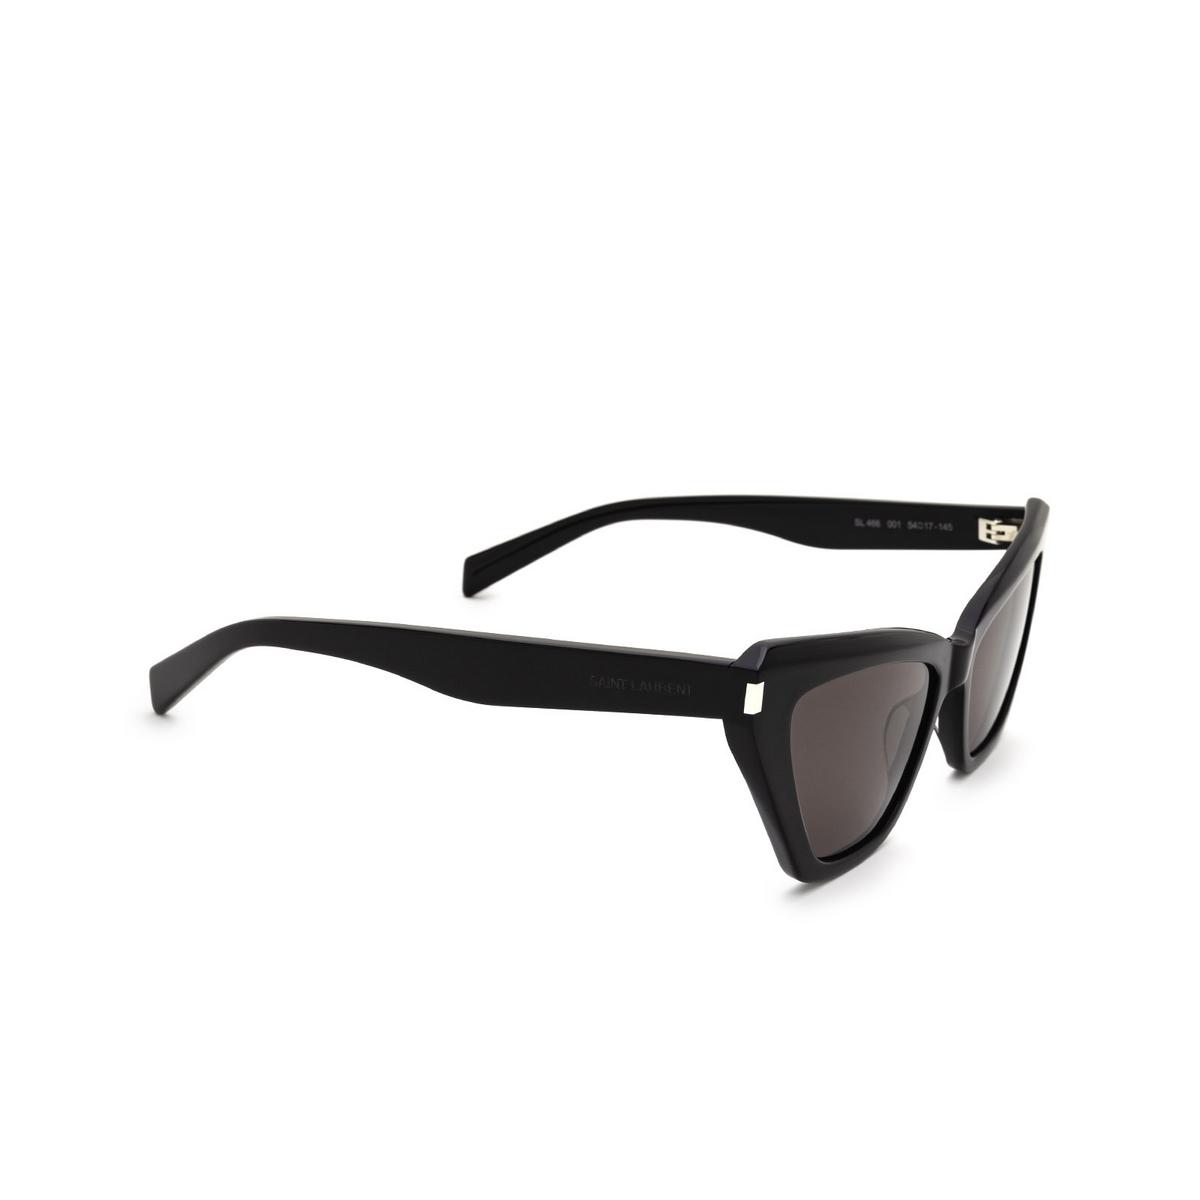 Saint Laurent® Cat-eye Sunglasses: SL 466 color Black 001 - three-quarters view.